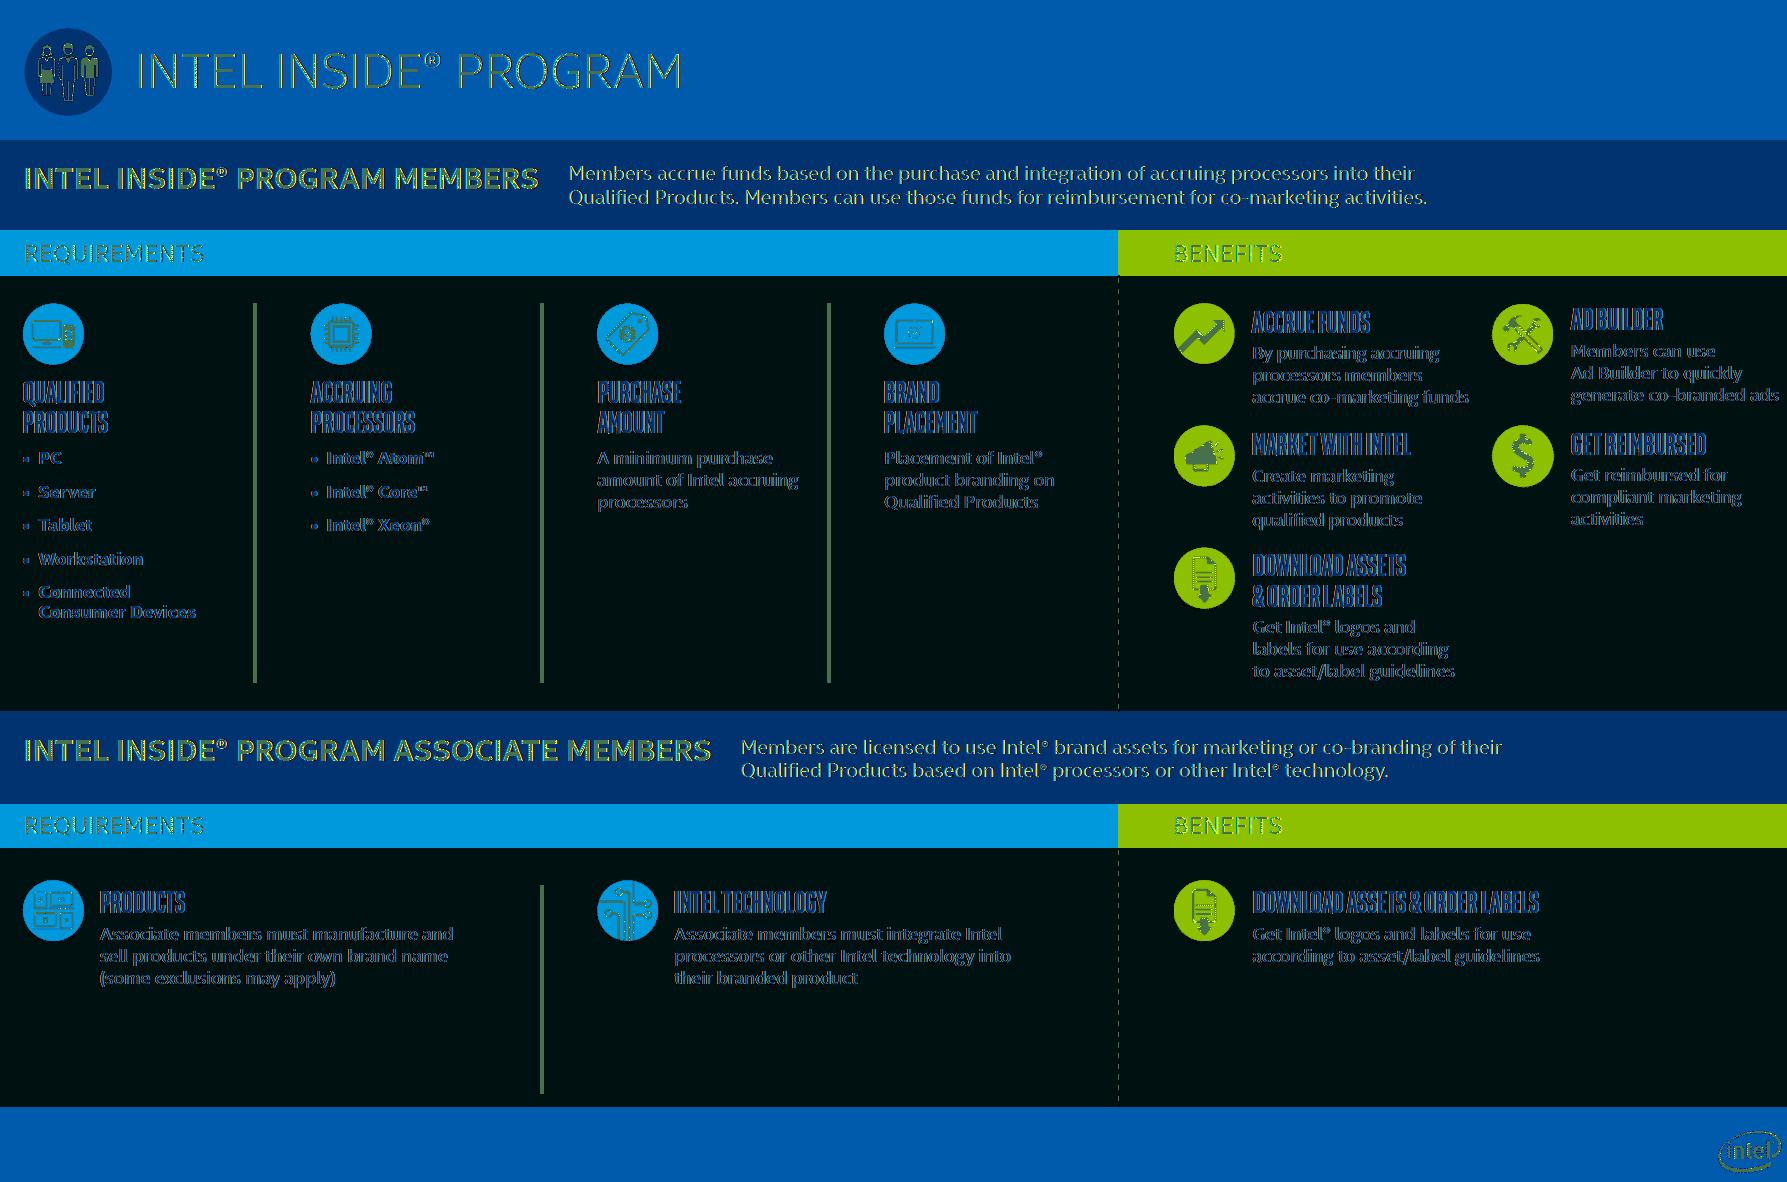 Intel Inside Program